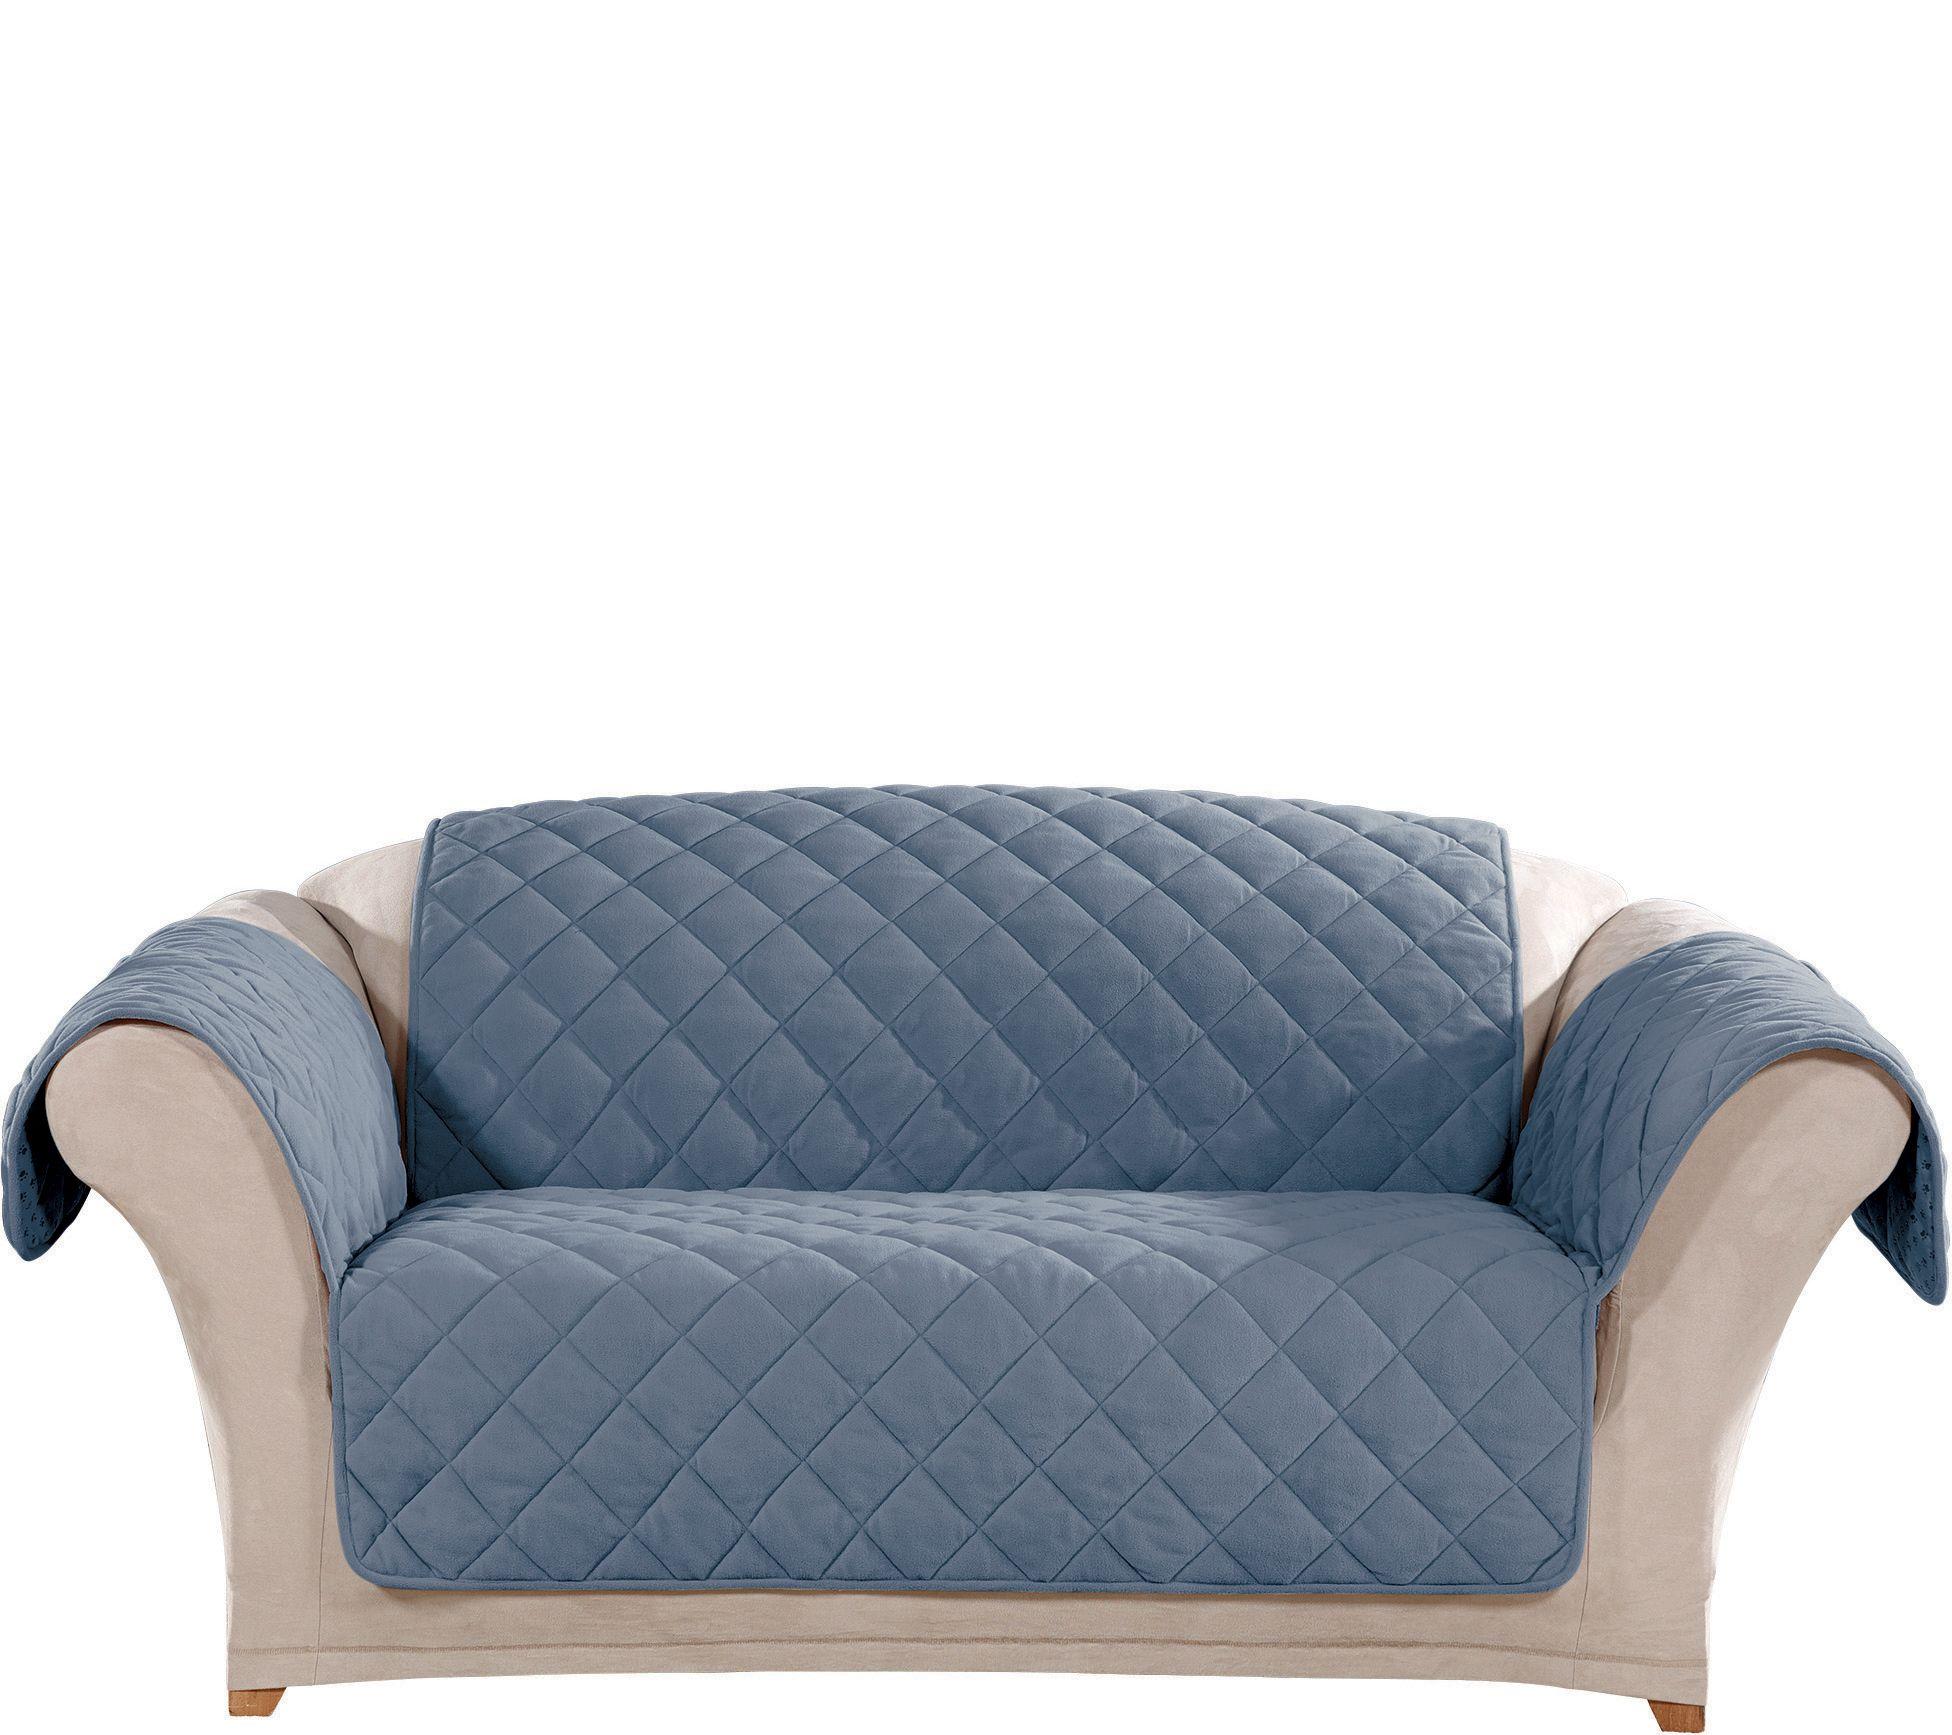 sure fit loveseat plush comfort waterproof furniture cover page 1 u2014 qvccom